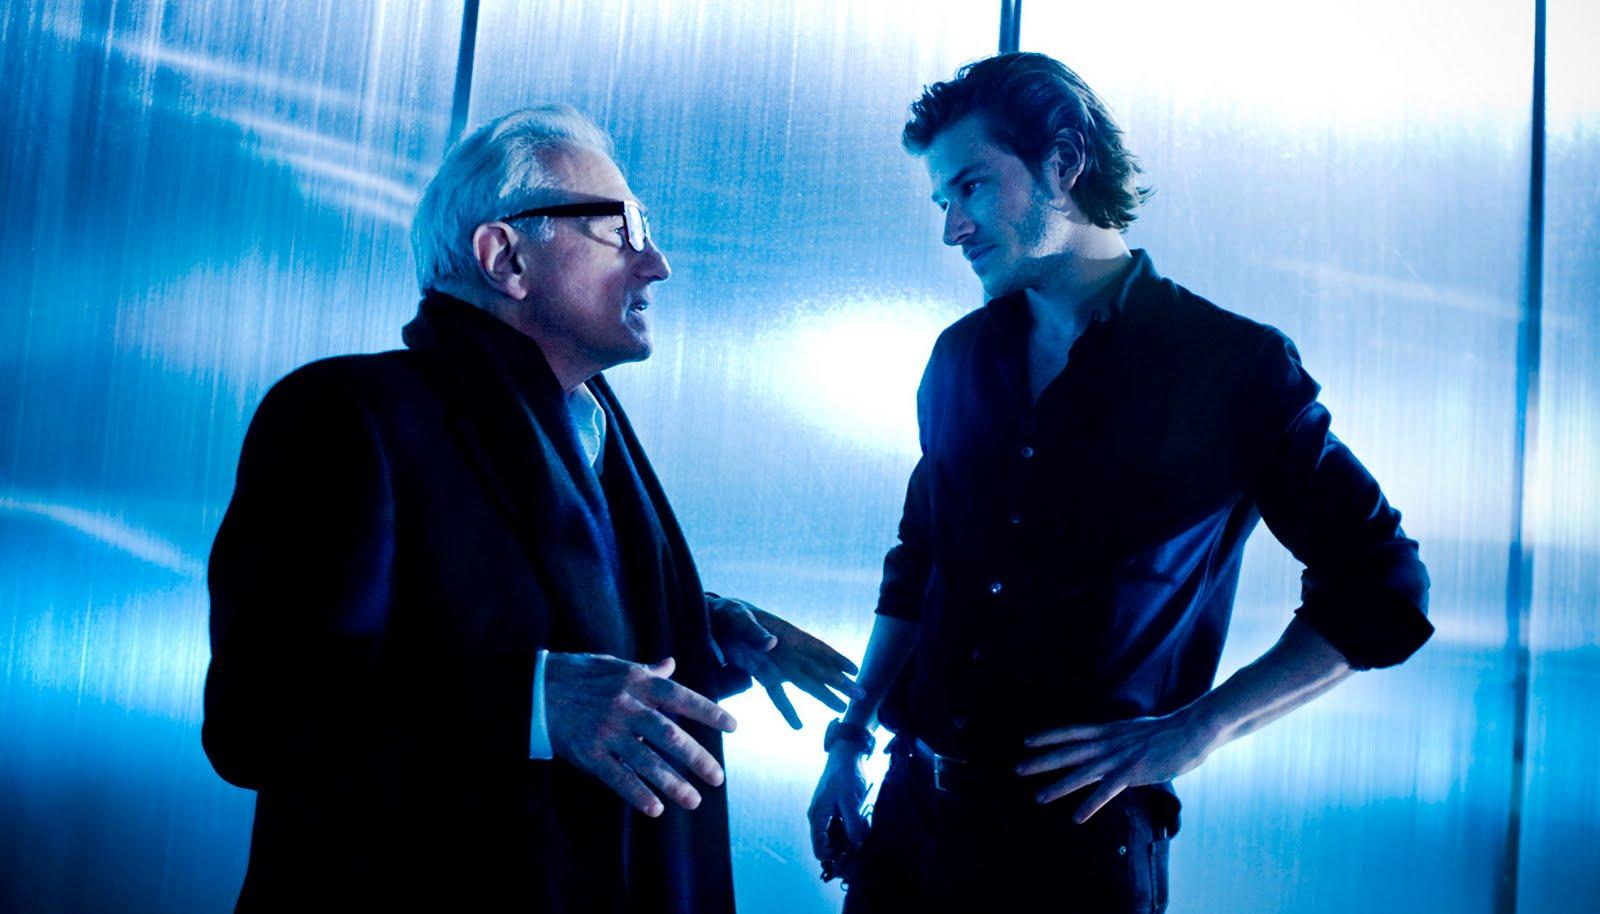 http://1.bp.blogspot.com/__0uwAzMW5Y0/THmymnaPM8I/AAAAAAAAAKA/f6fv1z0EbbQ/s1600/Gaspard-Ulliel-Scorsese-pub-Chanel.jpg